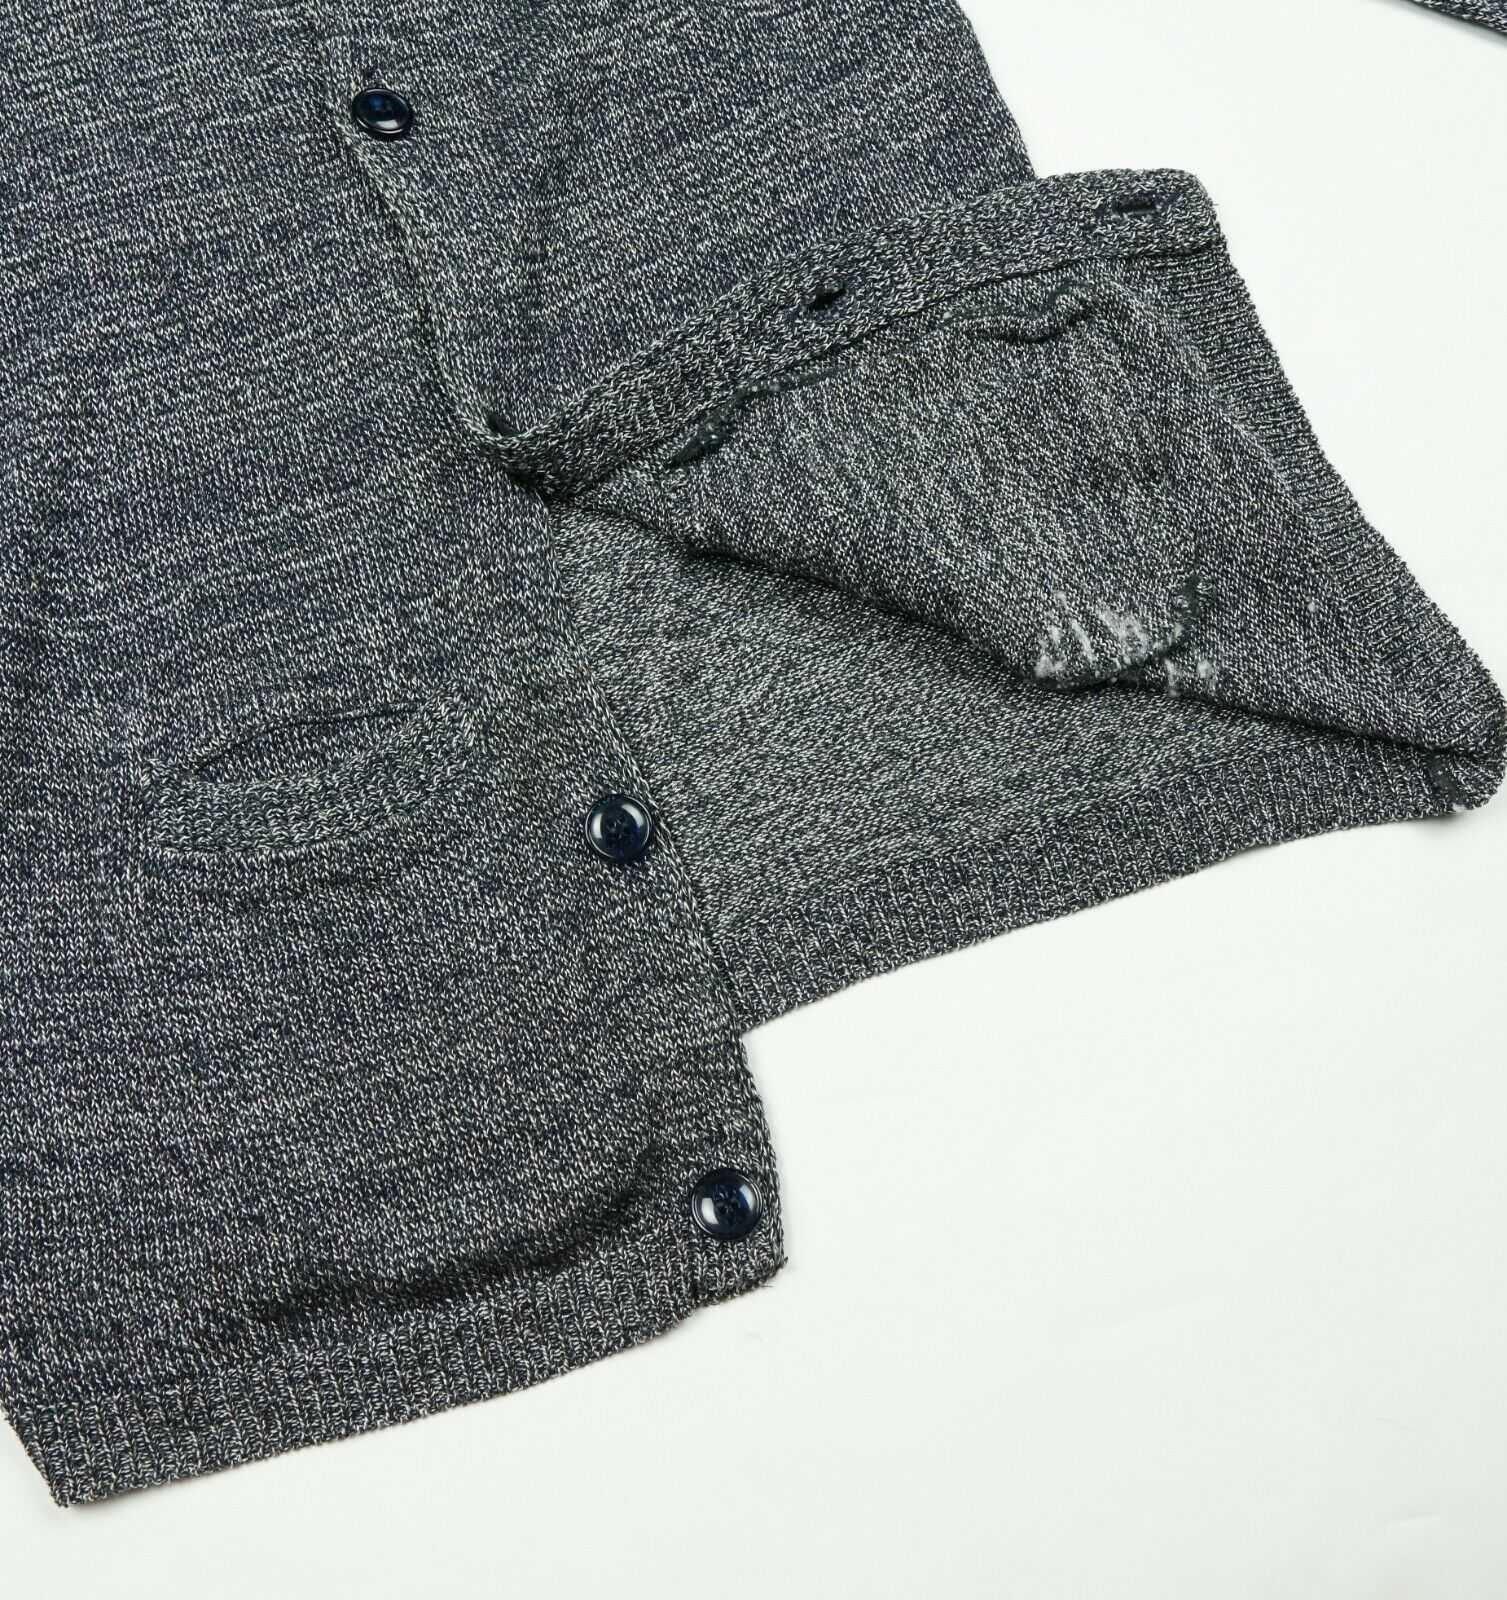 Blue Blue Japan Cotton Rayon Pure Indigo Knit Car… - image 8